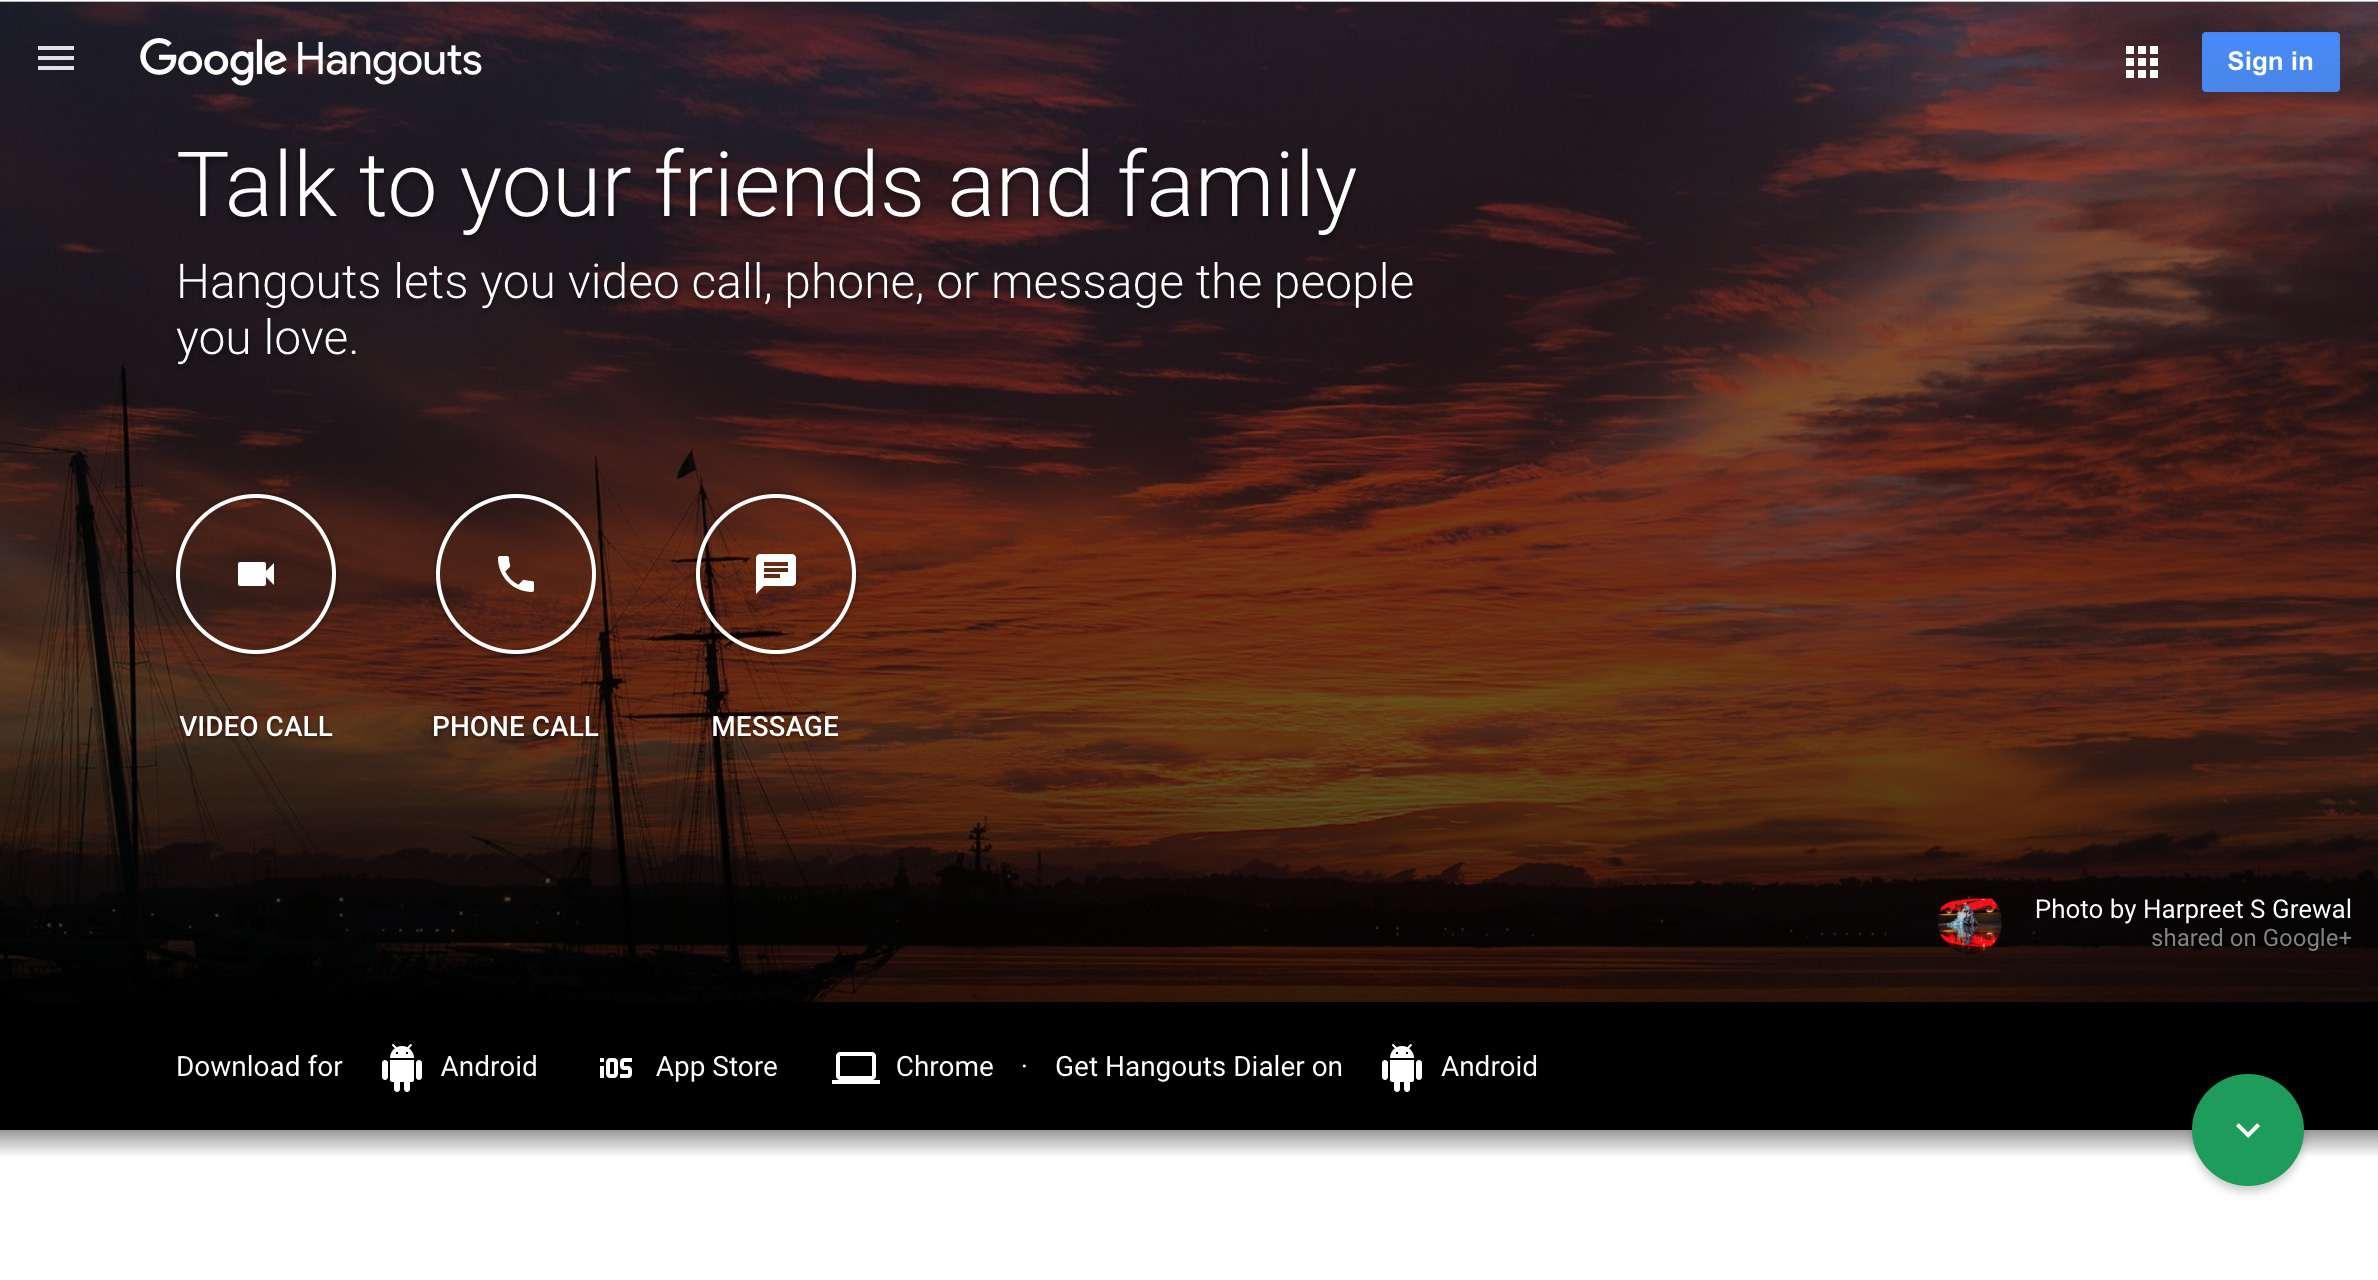 Google Hangouts web site